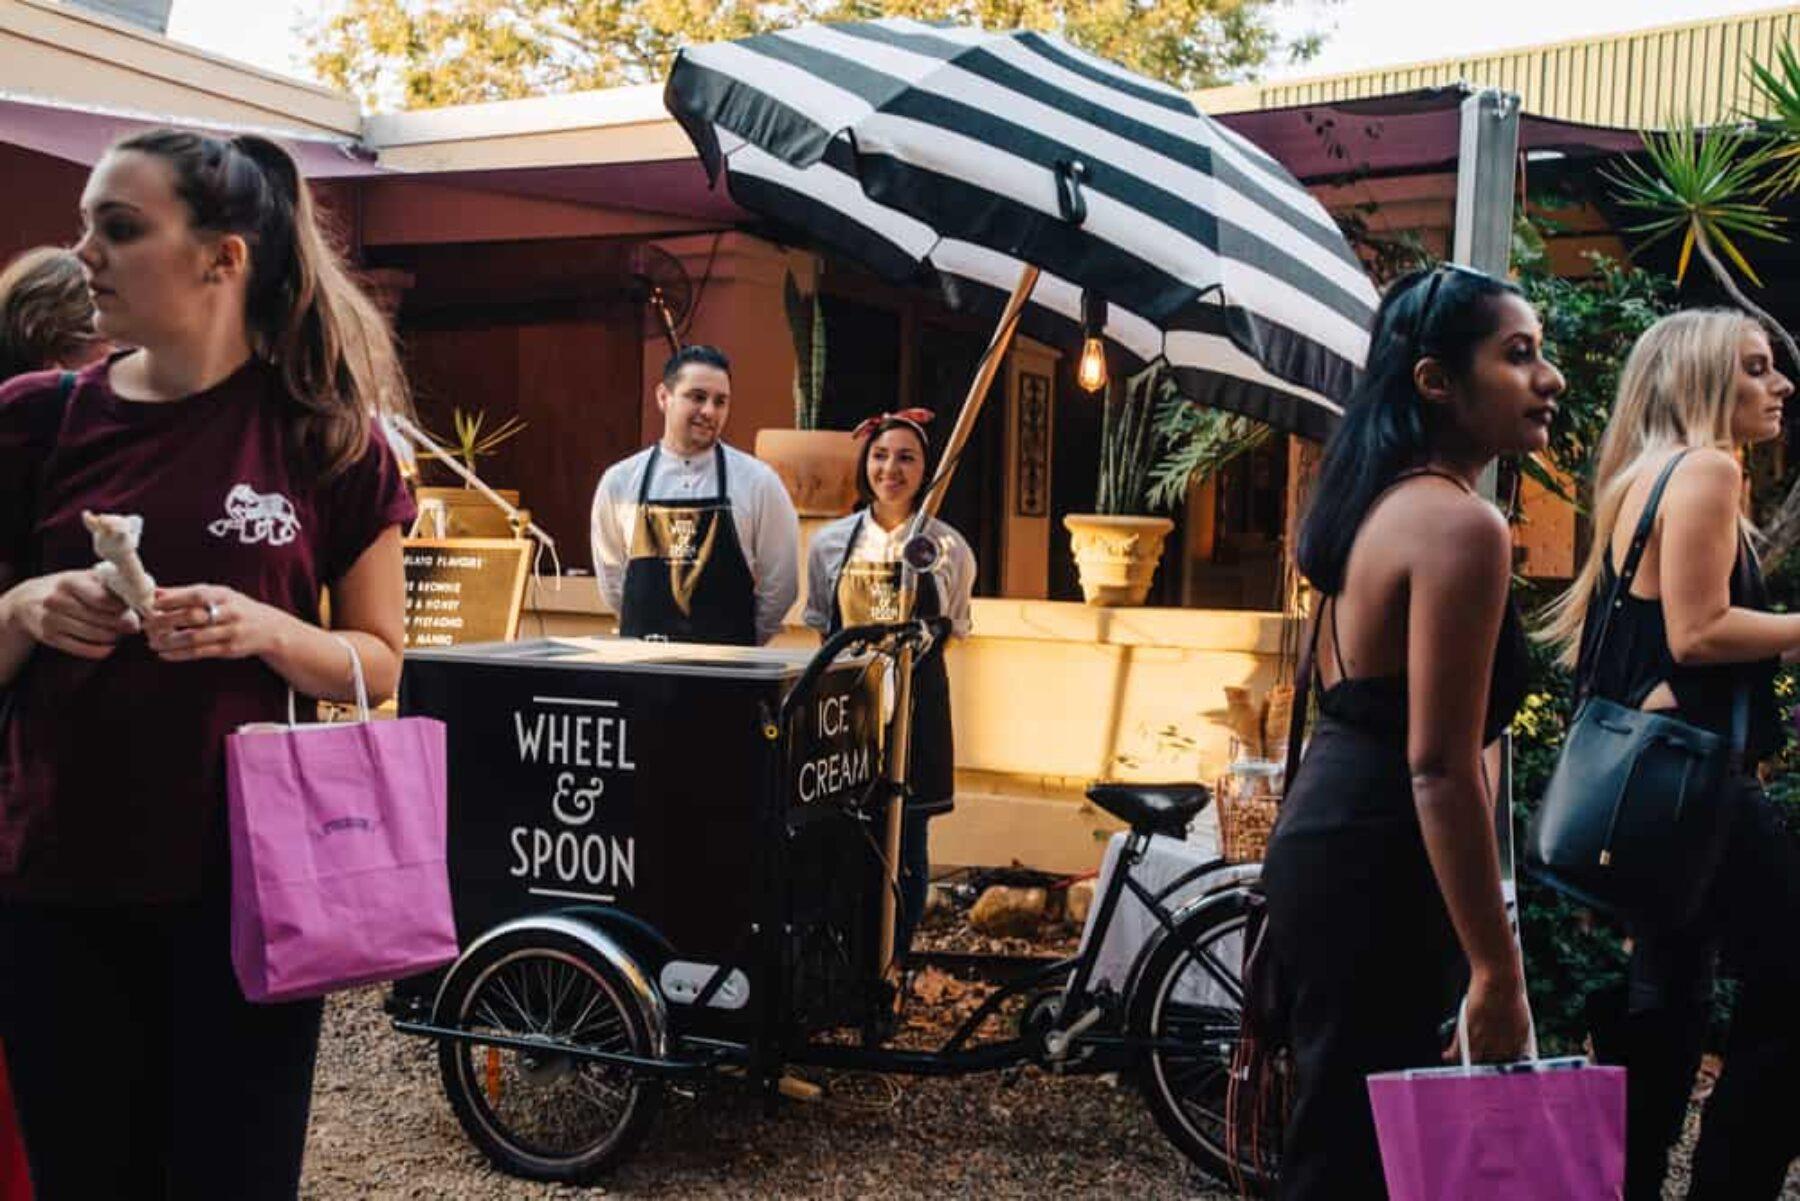 Brisbane wedding fair - The Bride's Market at Twilight